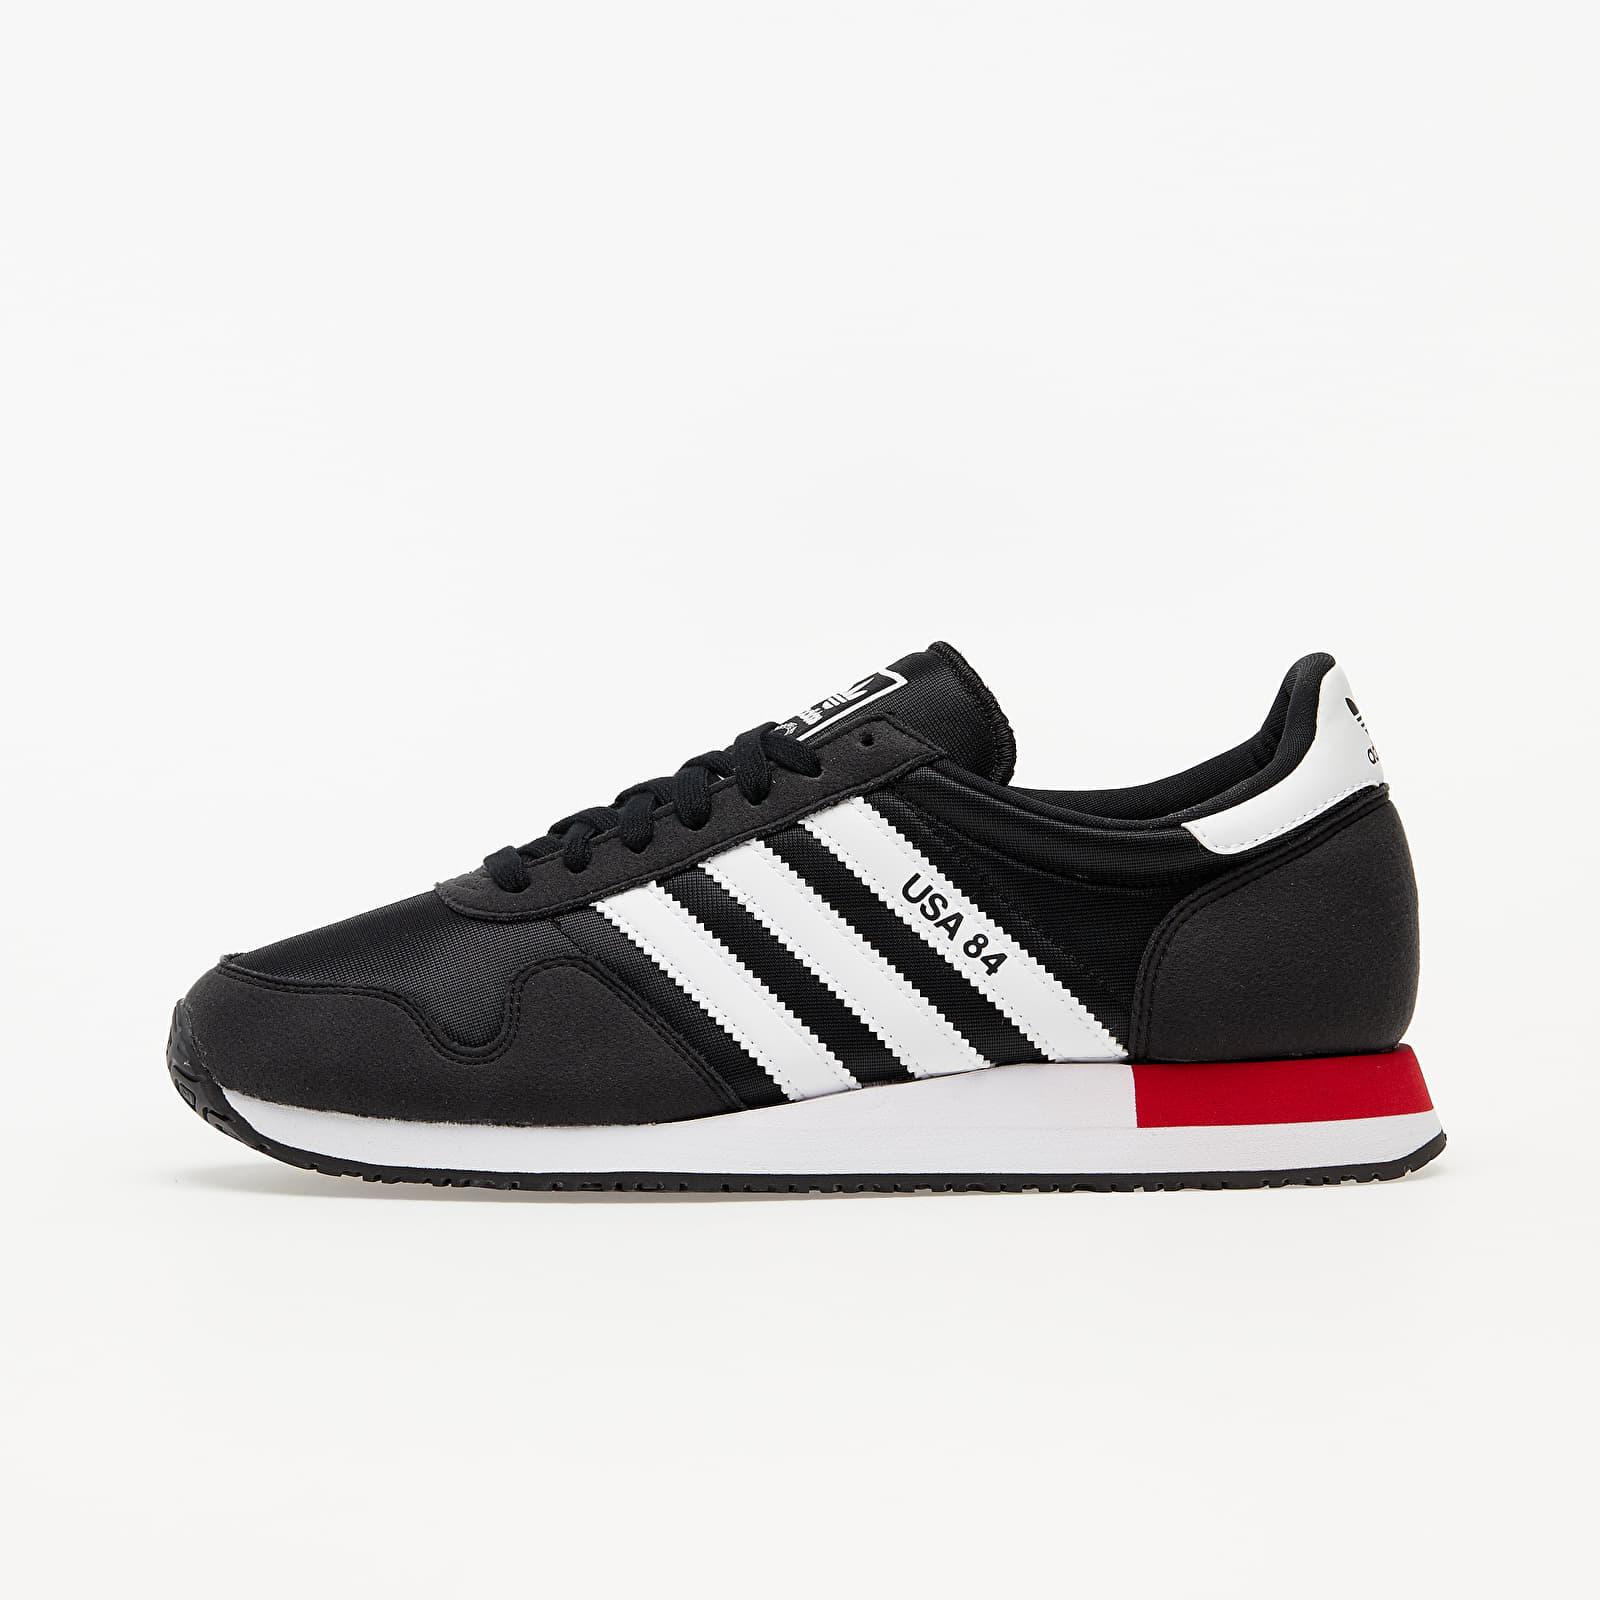 adidas Usa 84 Core Black/ Ftw White/ Scarlet FV2050